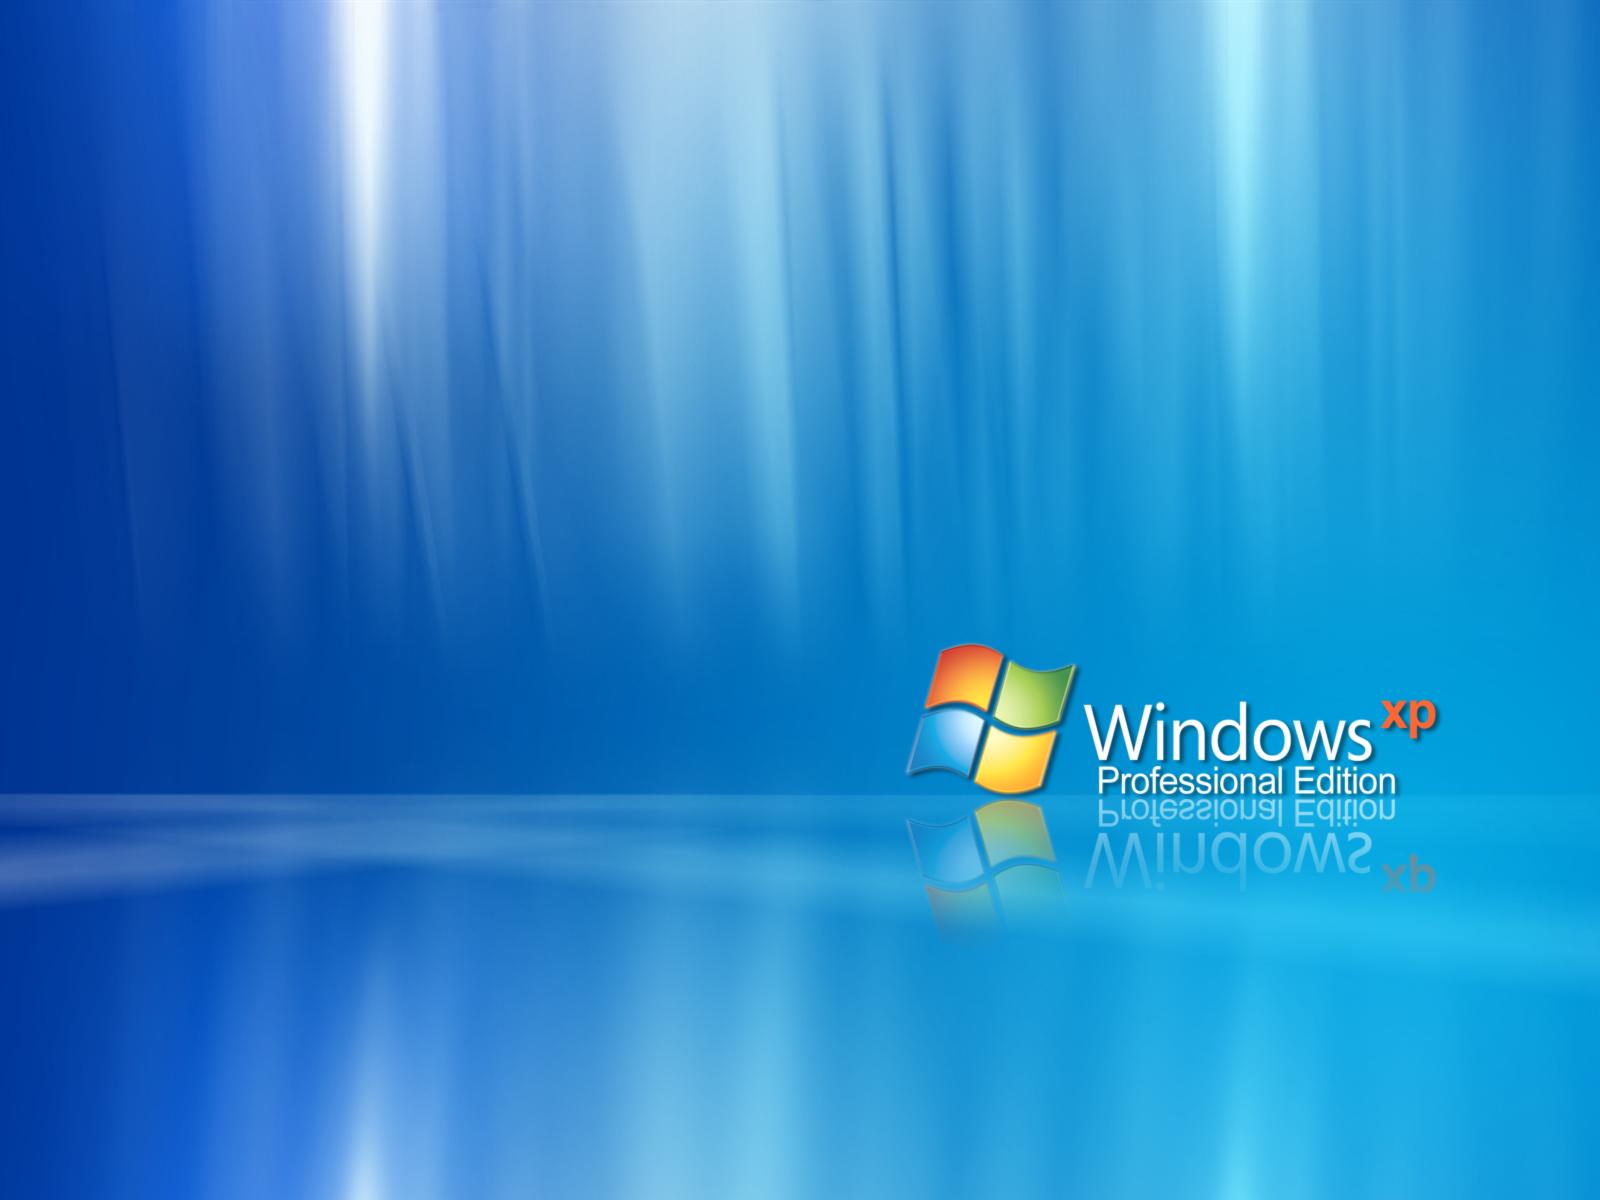 Windows_XP_Pro_screen-1600x1200